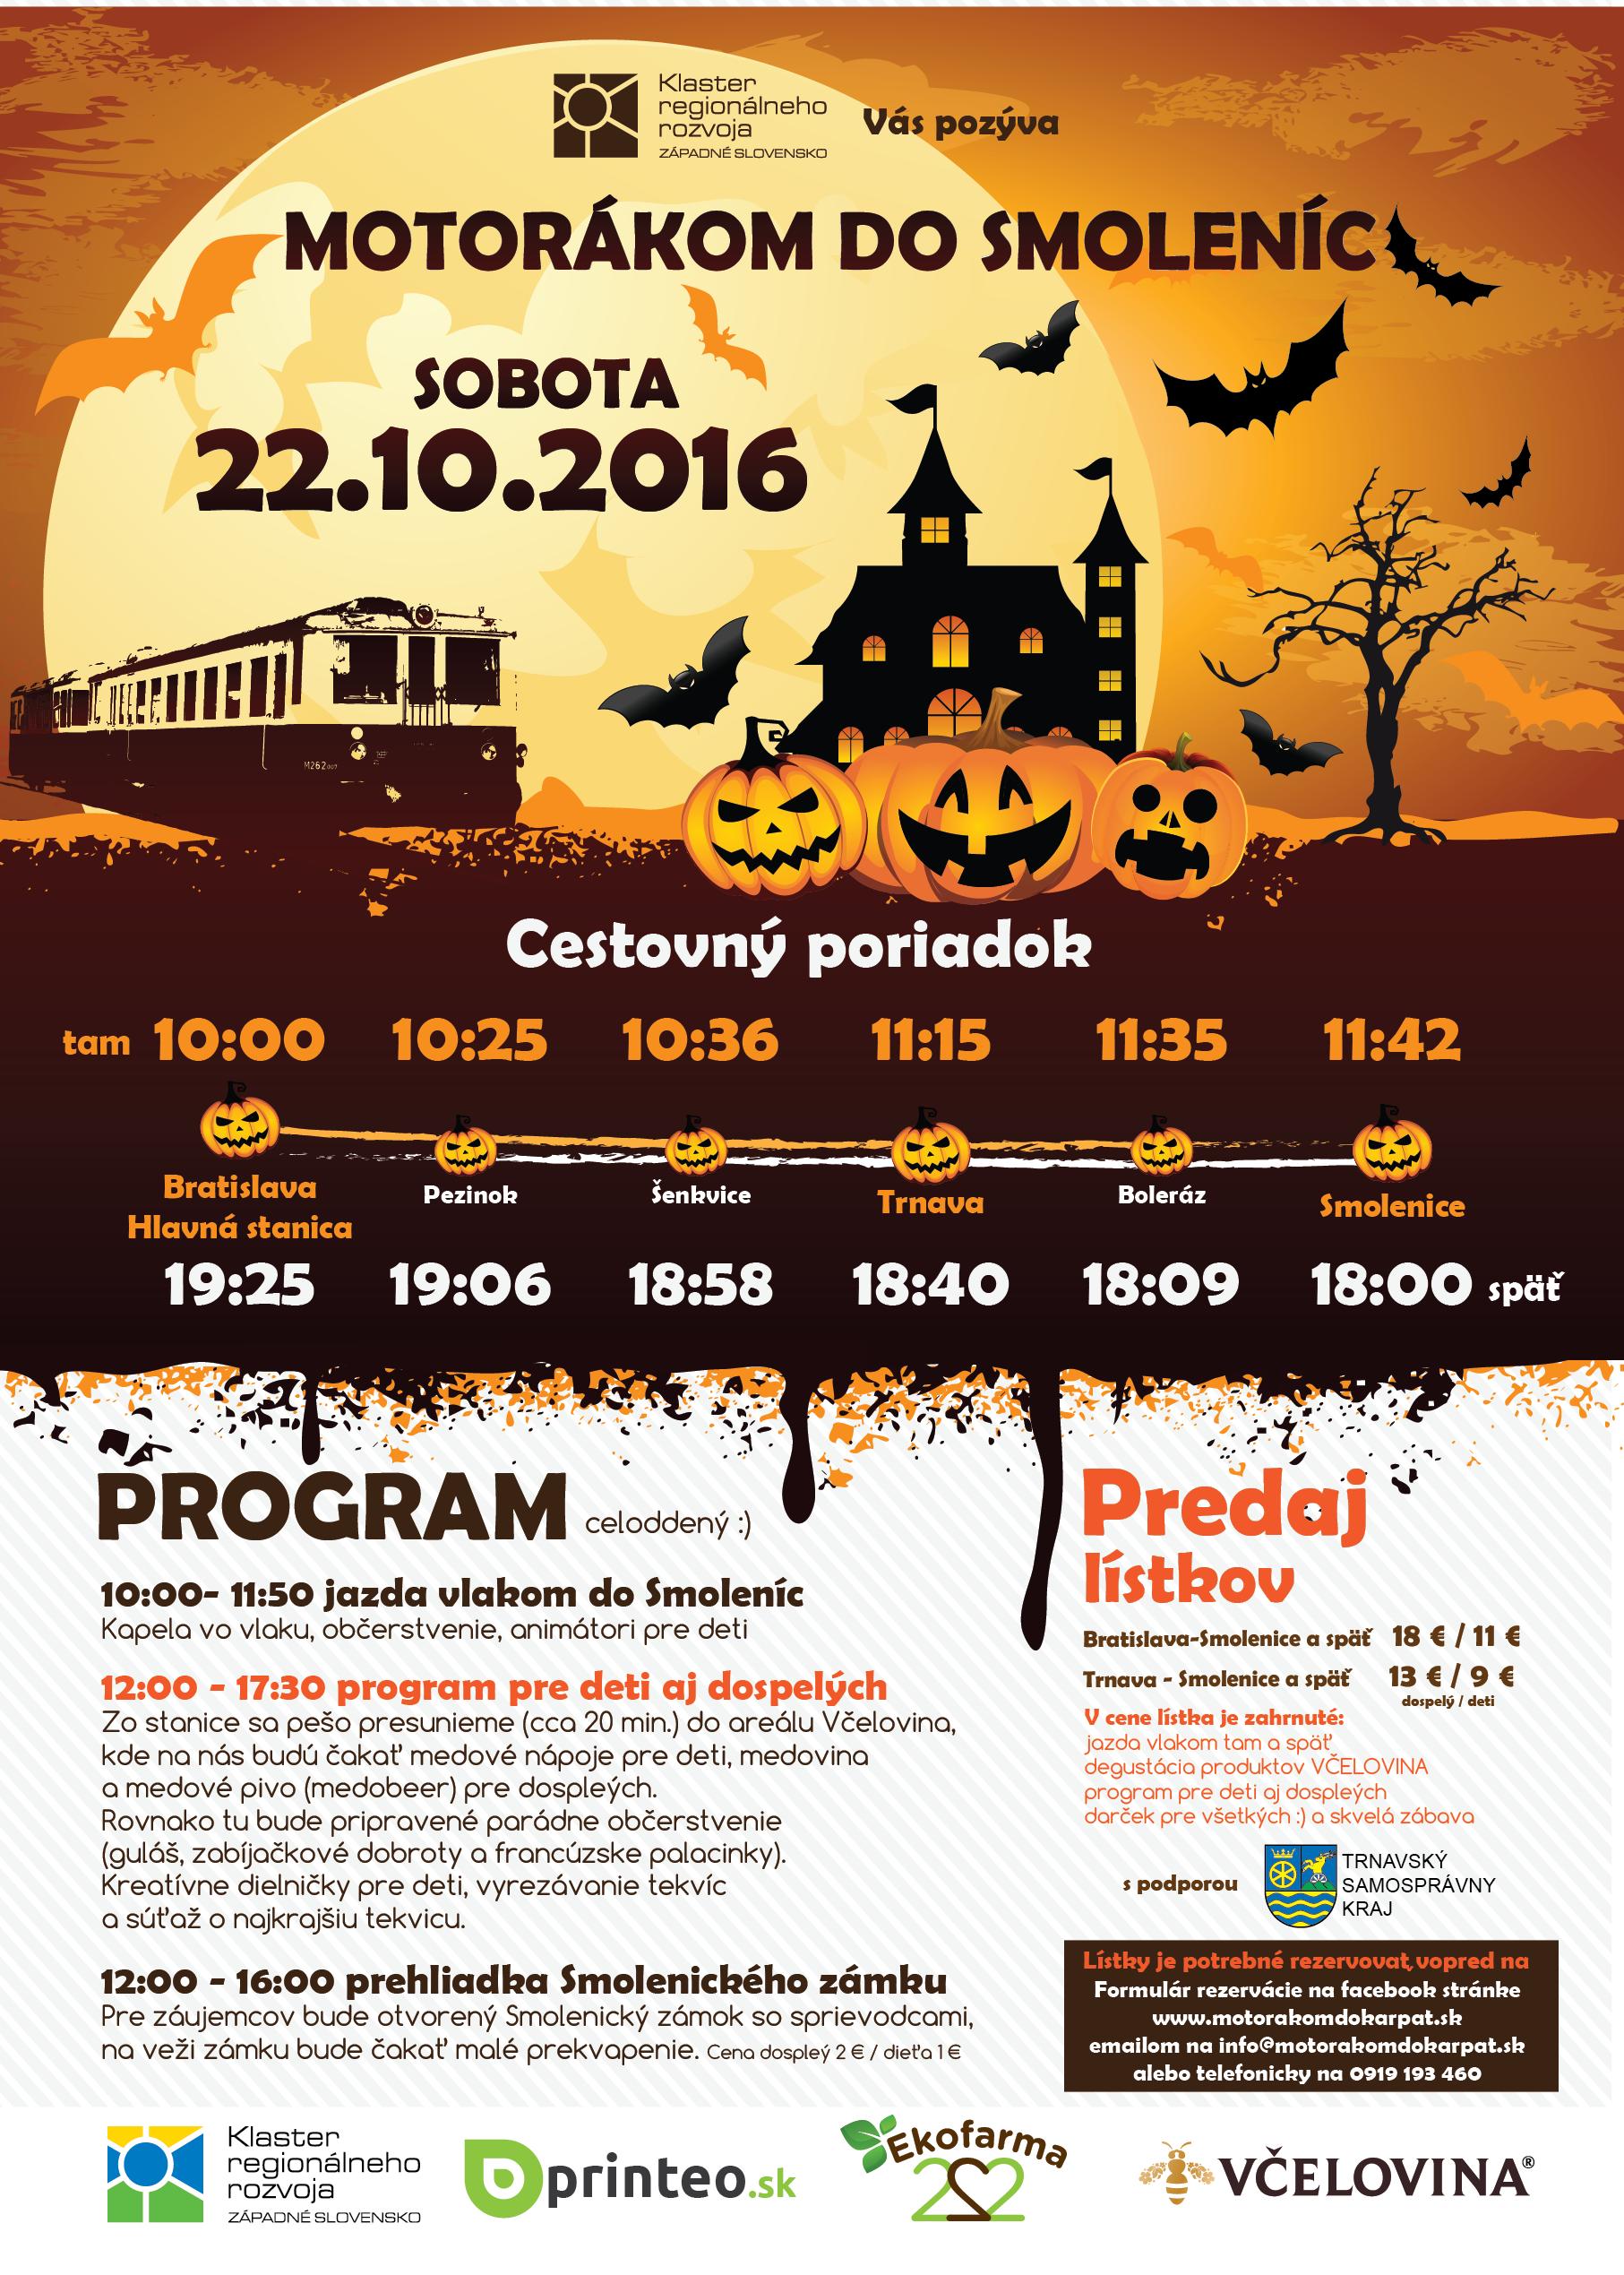 motorakom-do-karpat_22-10-2016-01